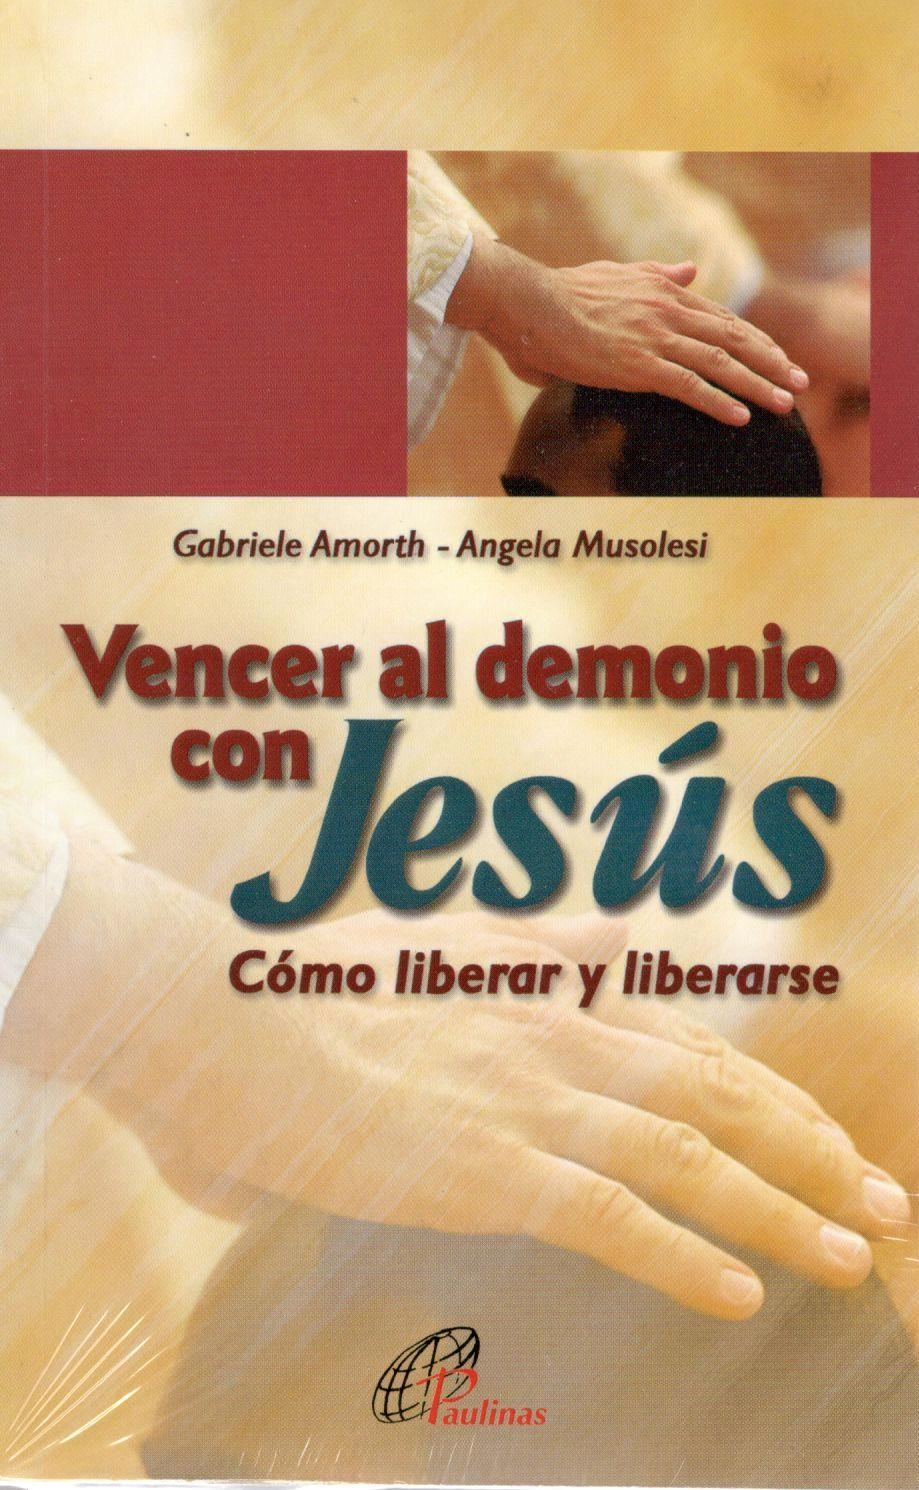 VENCER AL DEMONIO CON JESUS